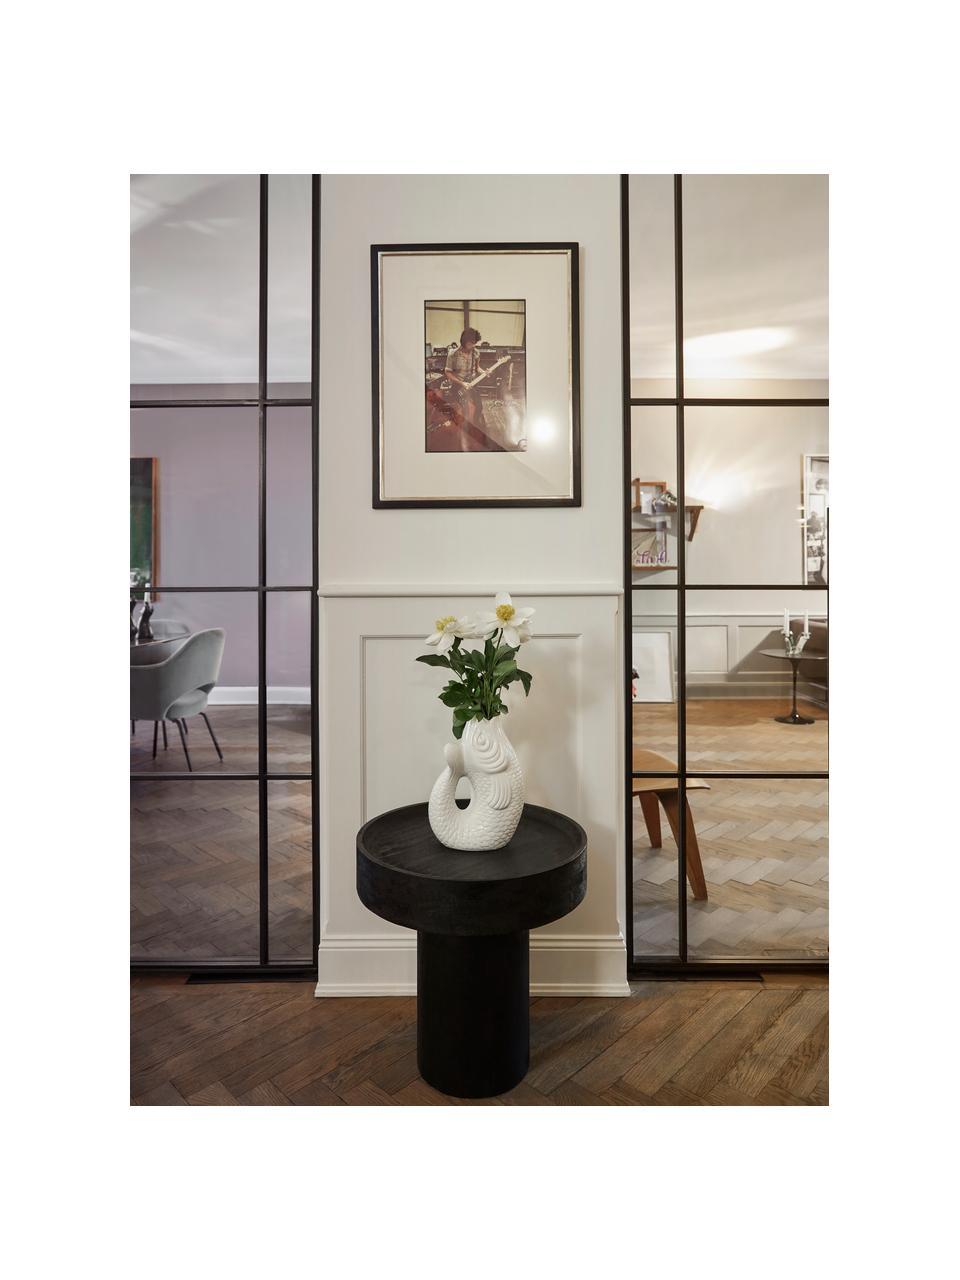 Beistelltisch Benno aus Mangoholz in Schwarz, Massives Mangoholz, lackiert, Beton, Schwarz, ∅ 50 x H 50 cm